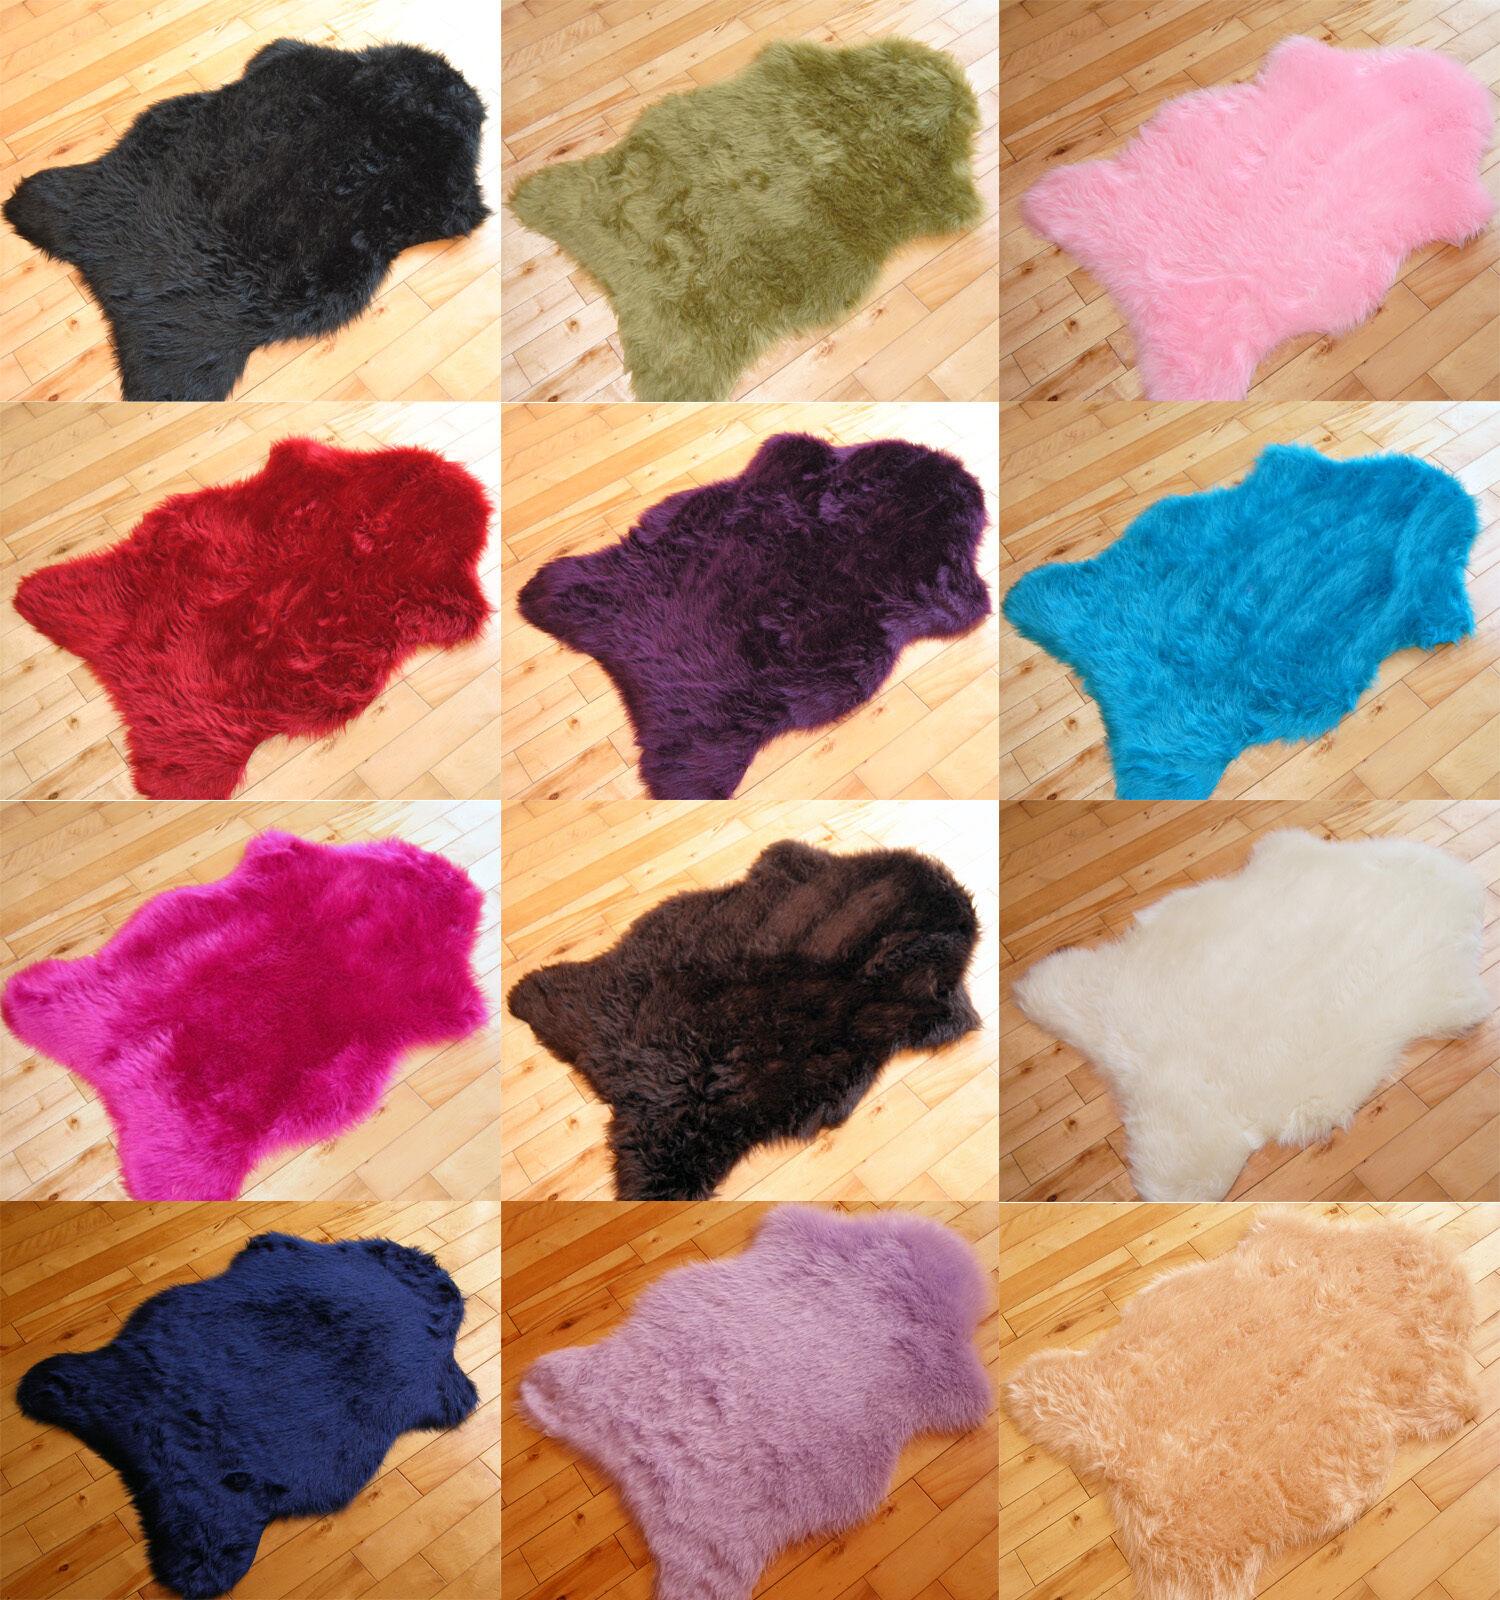 Soft Sheepskin Plain Fluffy Skin Faux Fur Fake Rug Cheap